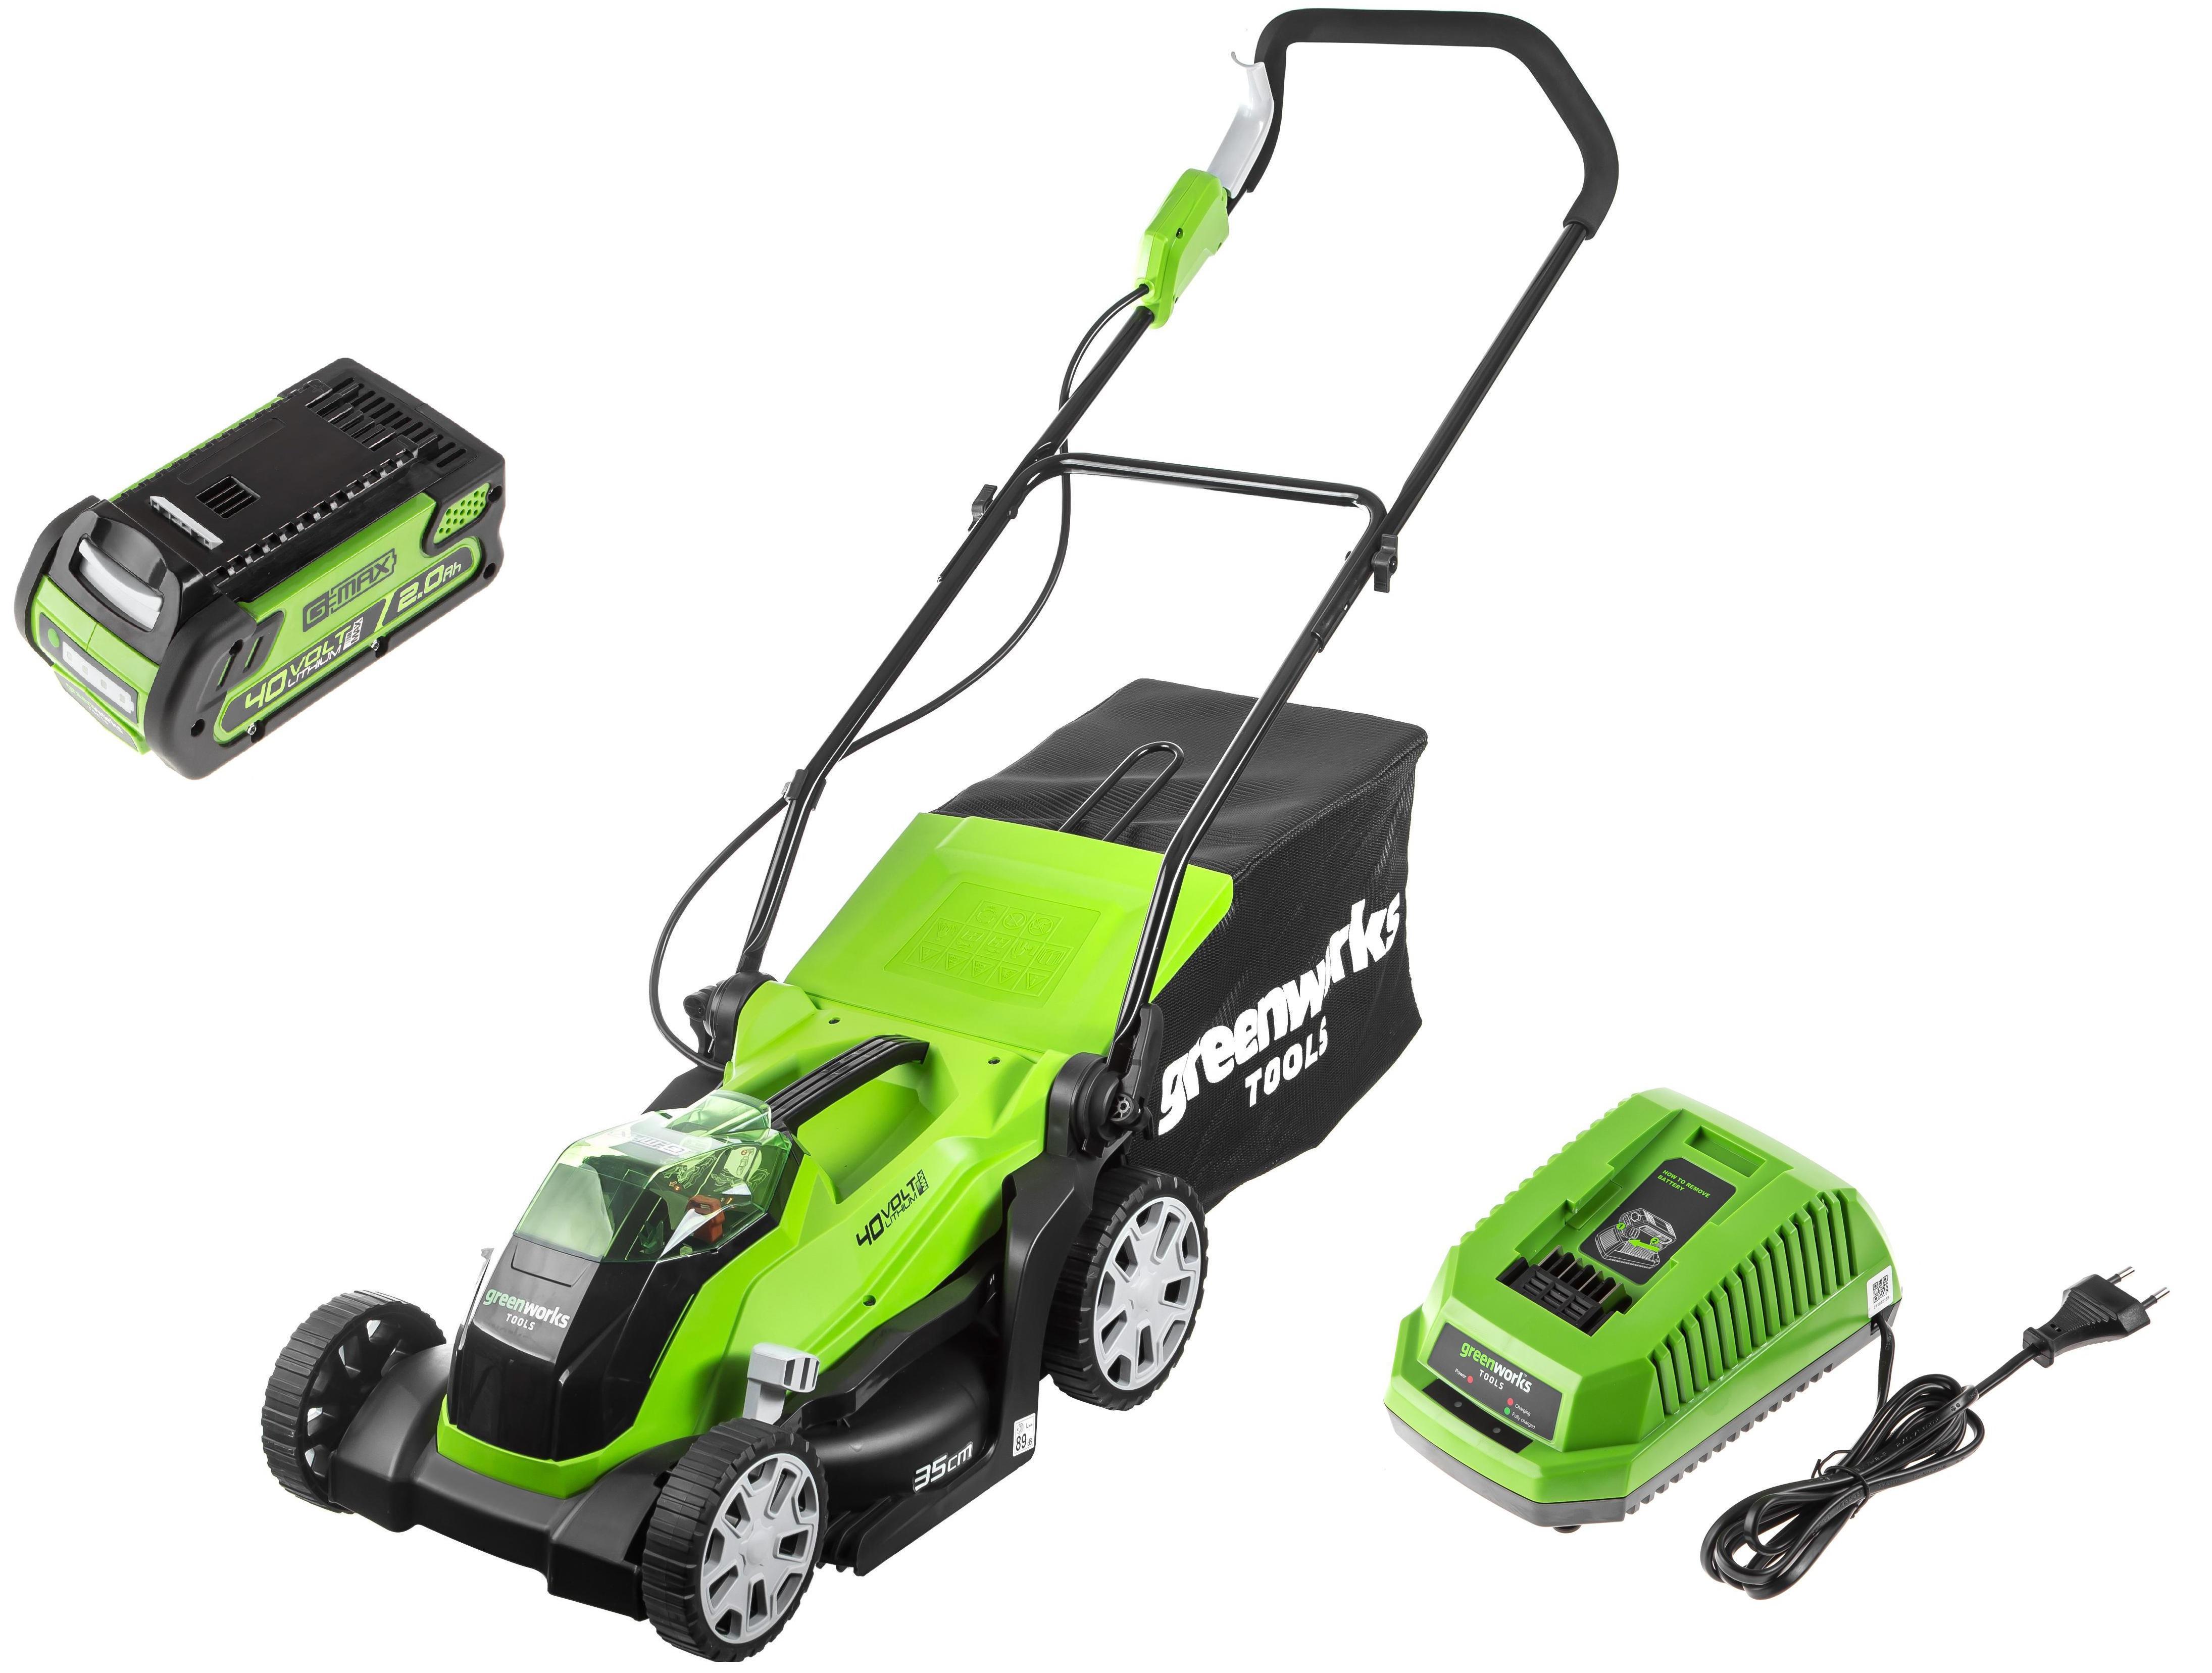 Аккумуляторная газонокосилка Greenworks G40lm35k2x (2501907ua) 1х40В 2Ач ЗУ